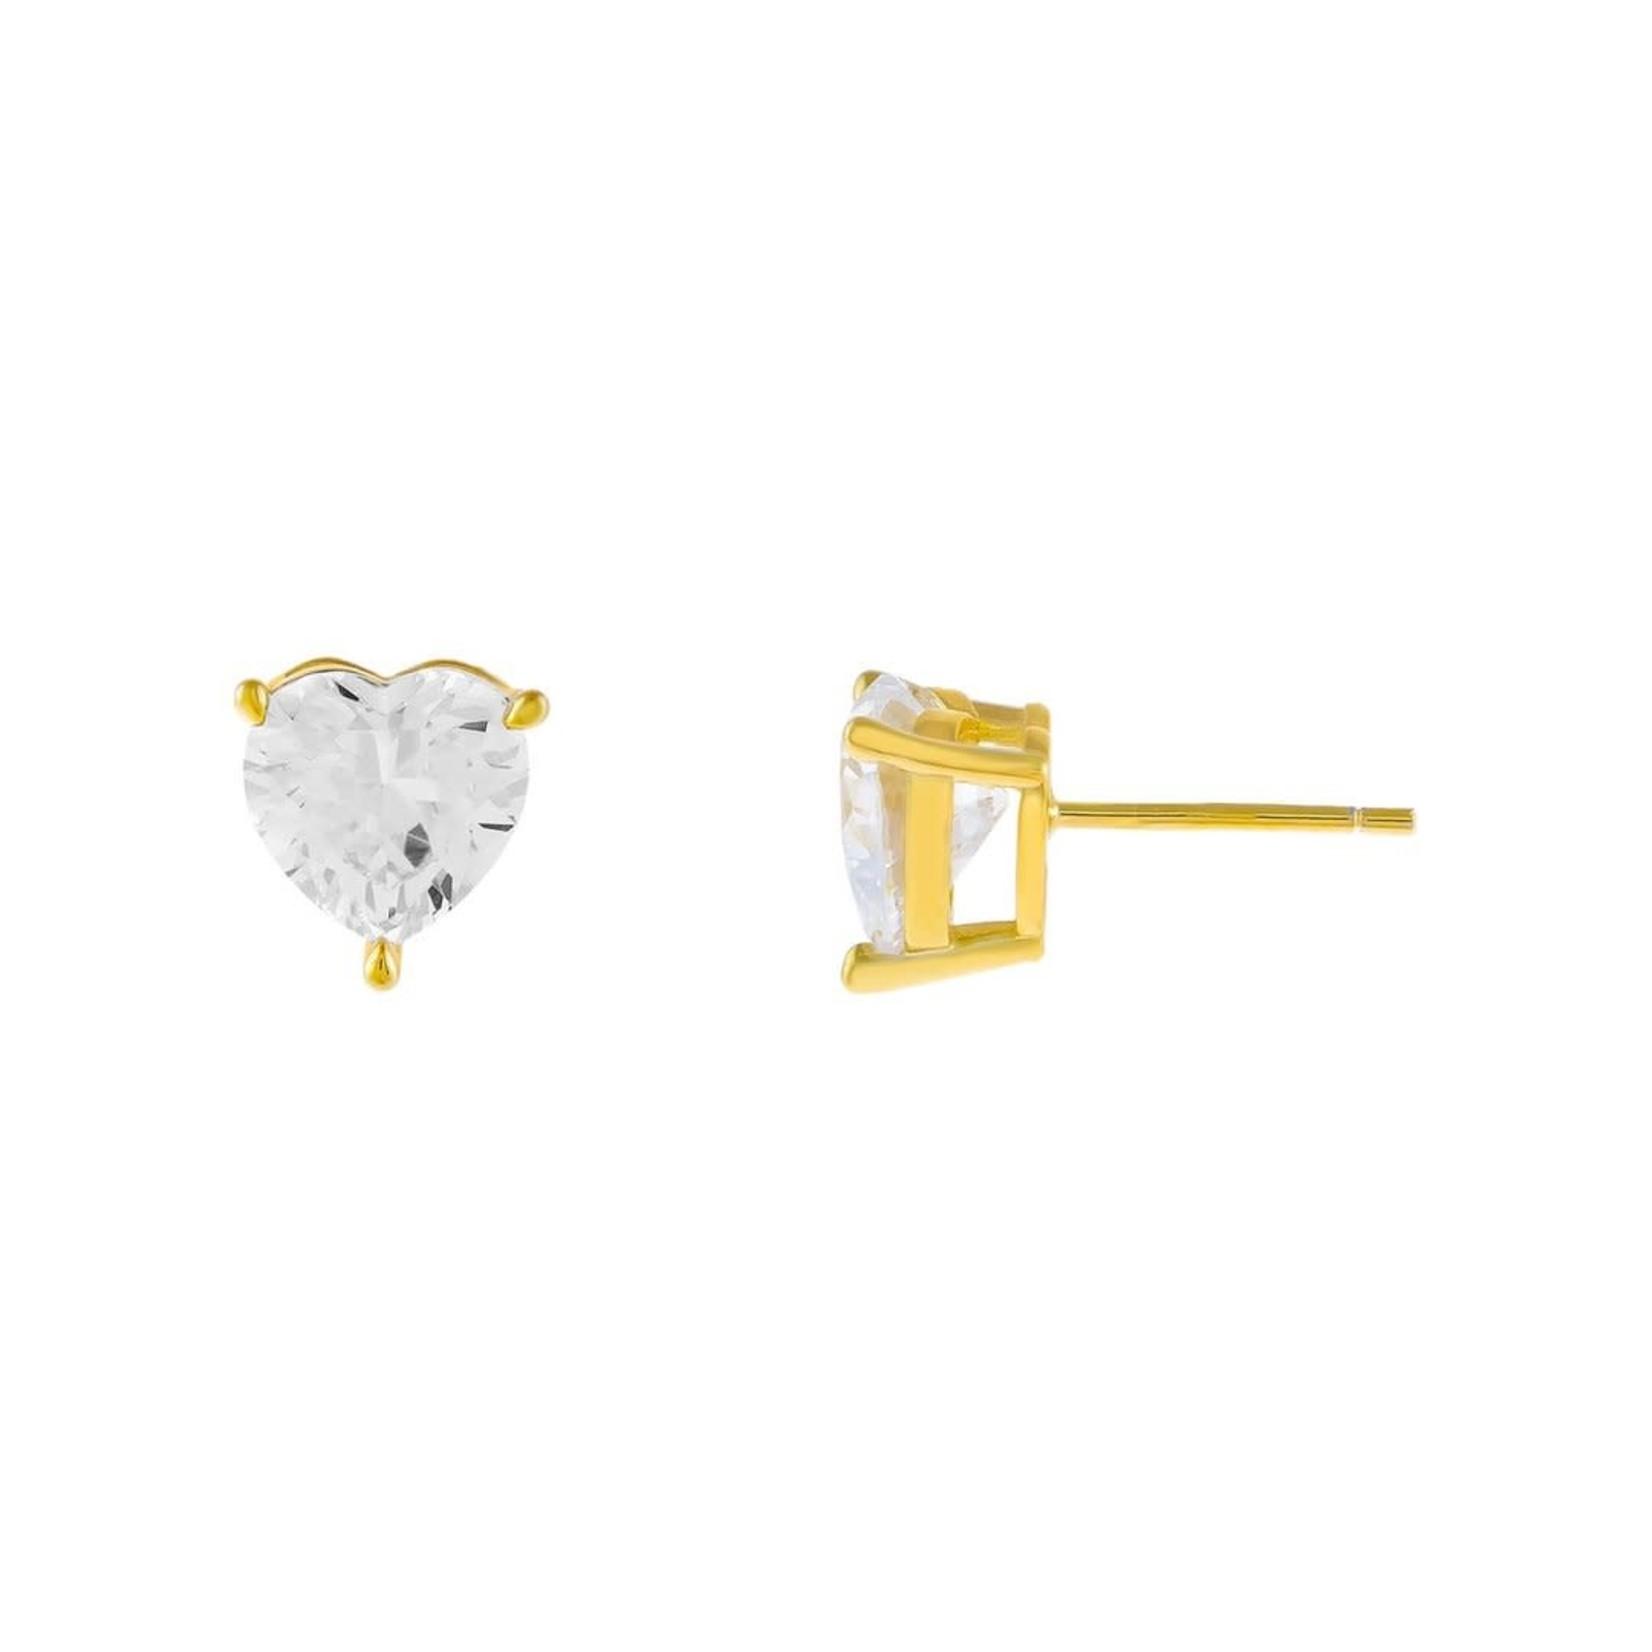 Adinas CZ Heart Stone Stud Earrings